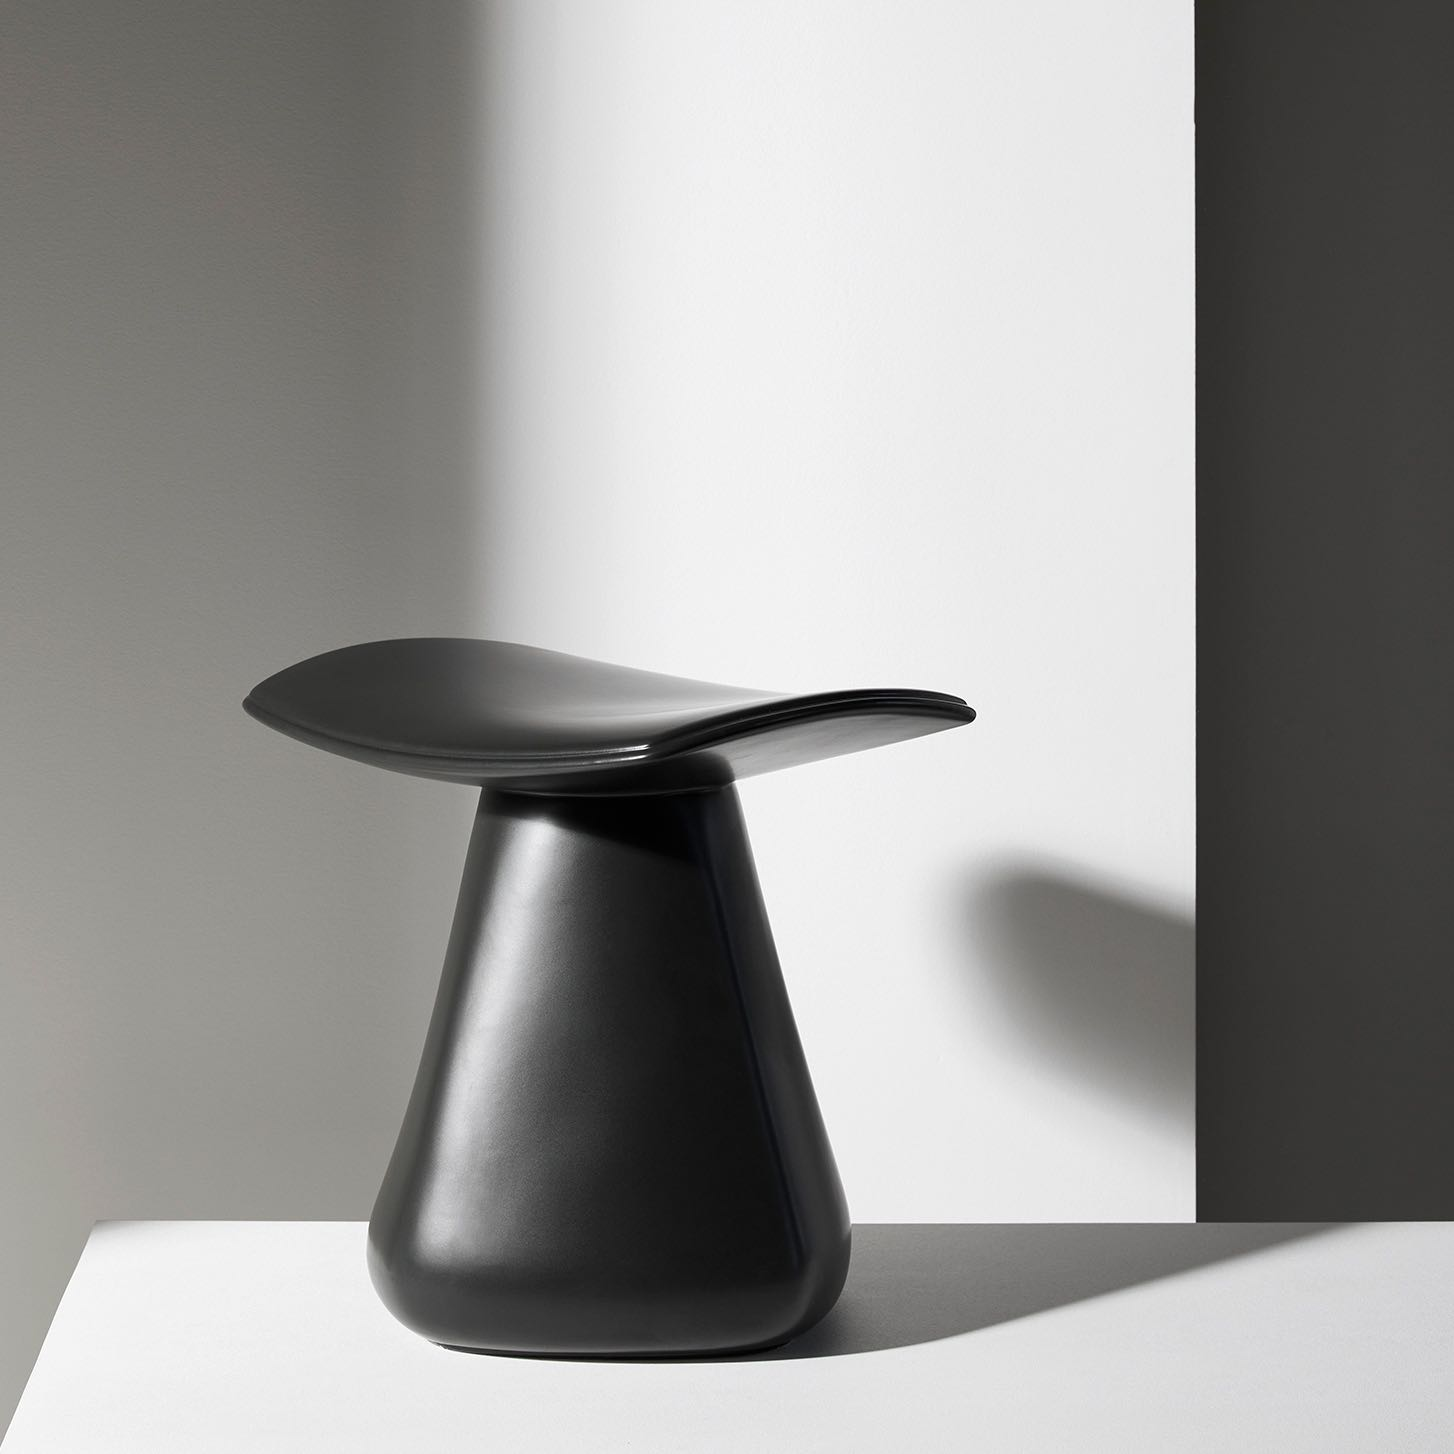 DAM-stool-matt-black-ceramic-christophe-delcourt-Collection-Particuliere